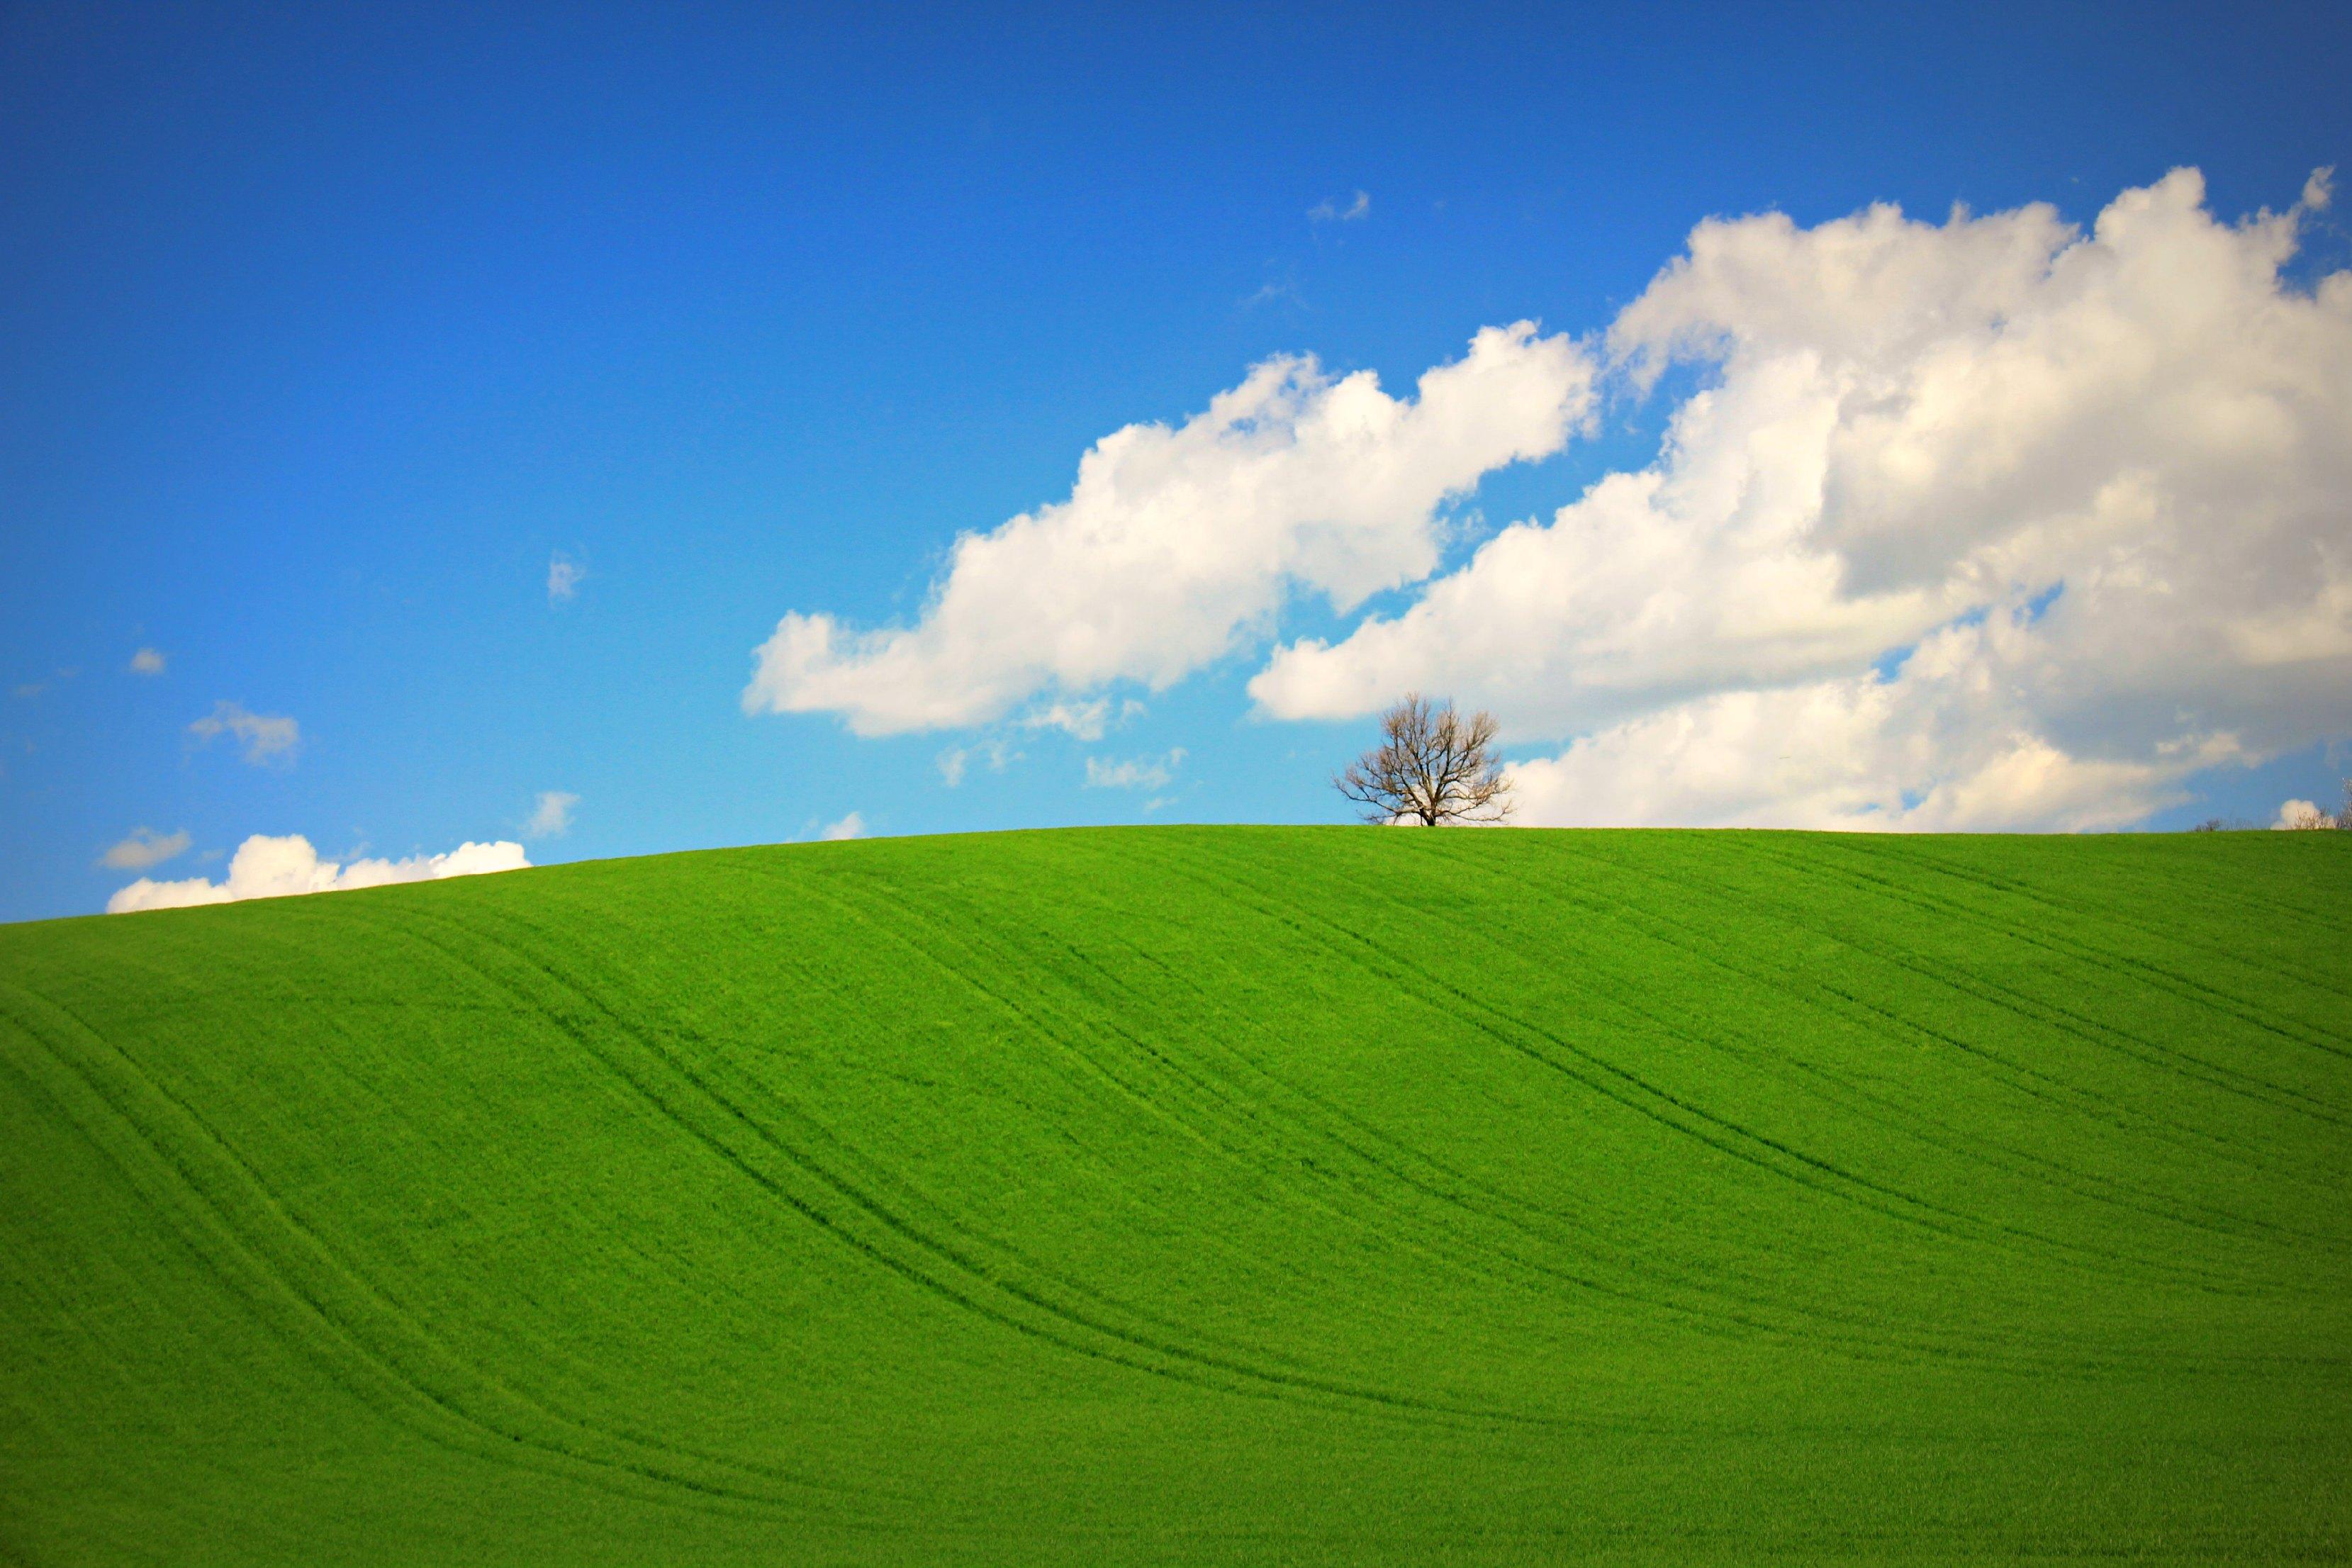 Hermosa pradera verde - 3318x2212